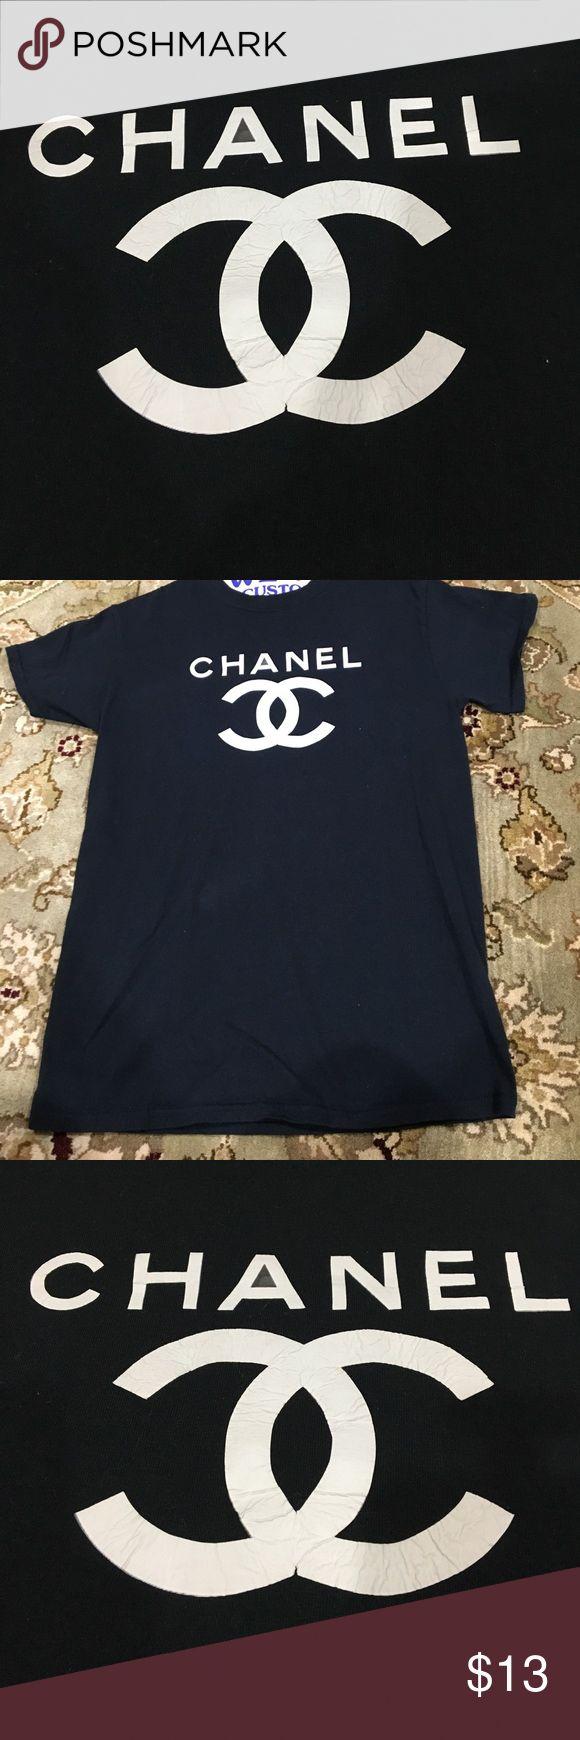 "Double C Chanel"" Top ""Double C Chanel"" logo tee shirt. Was"